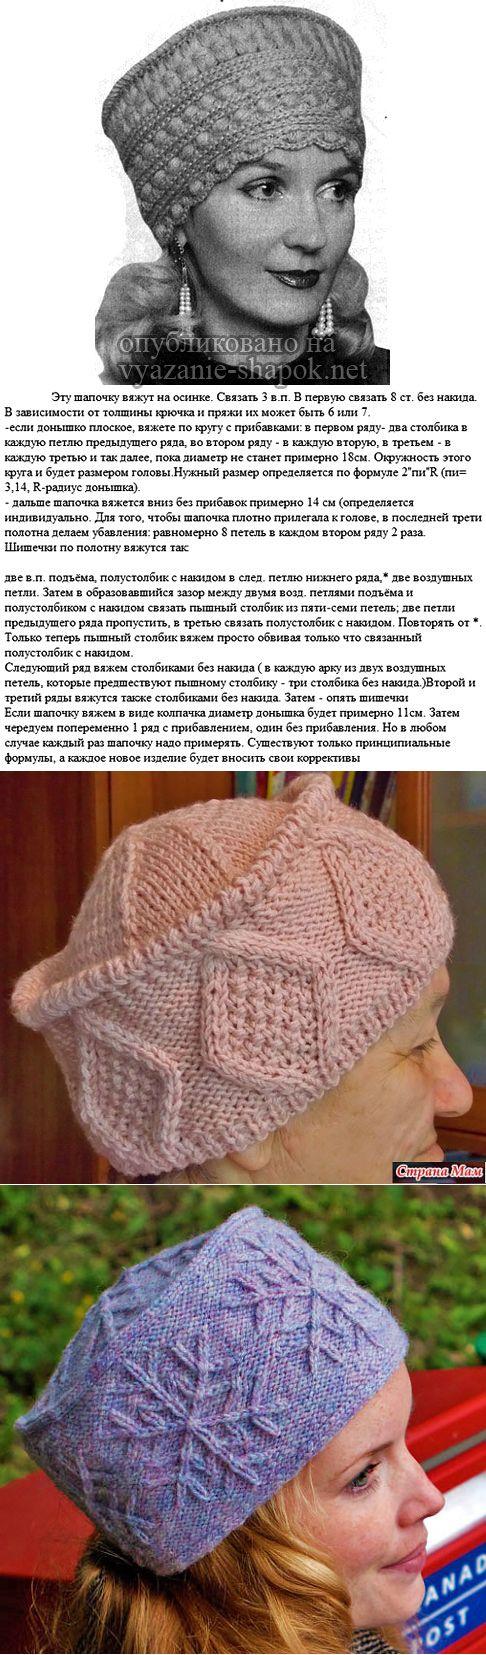 шапка труба схема вязания спицами онлайн